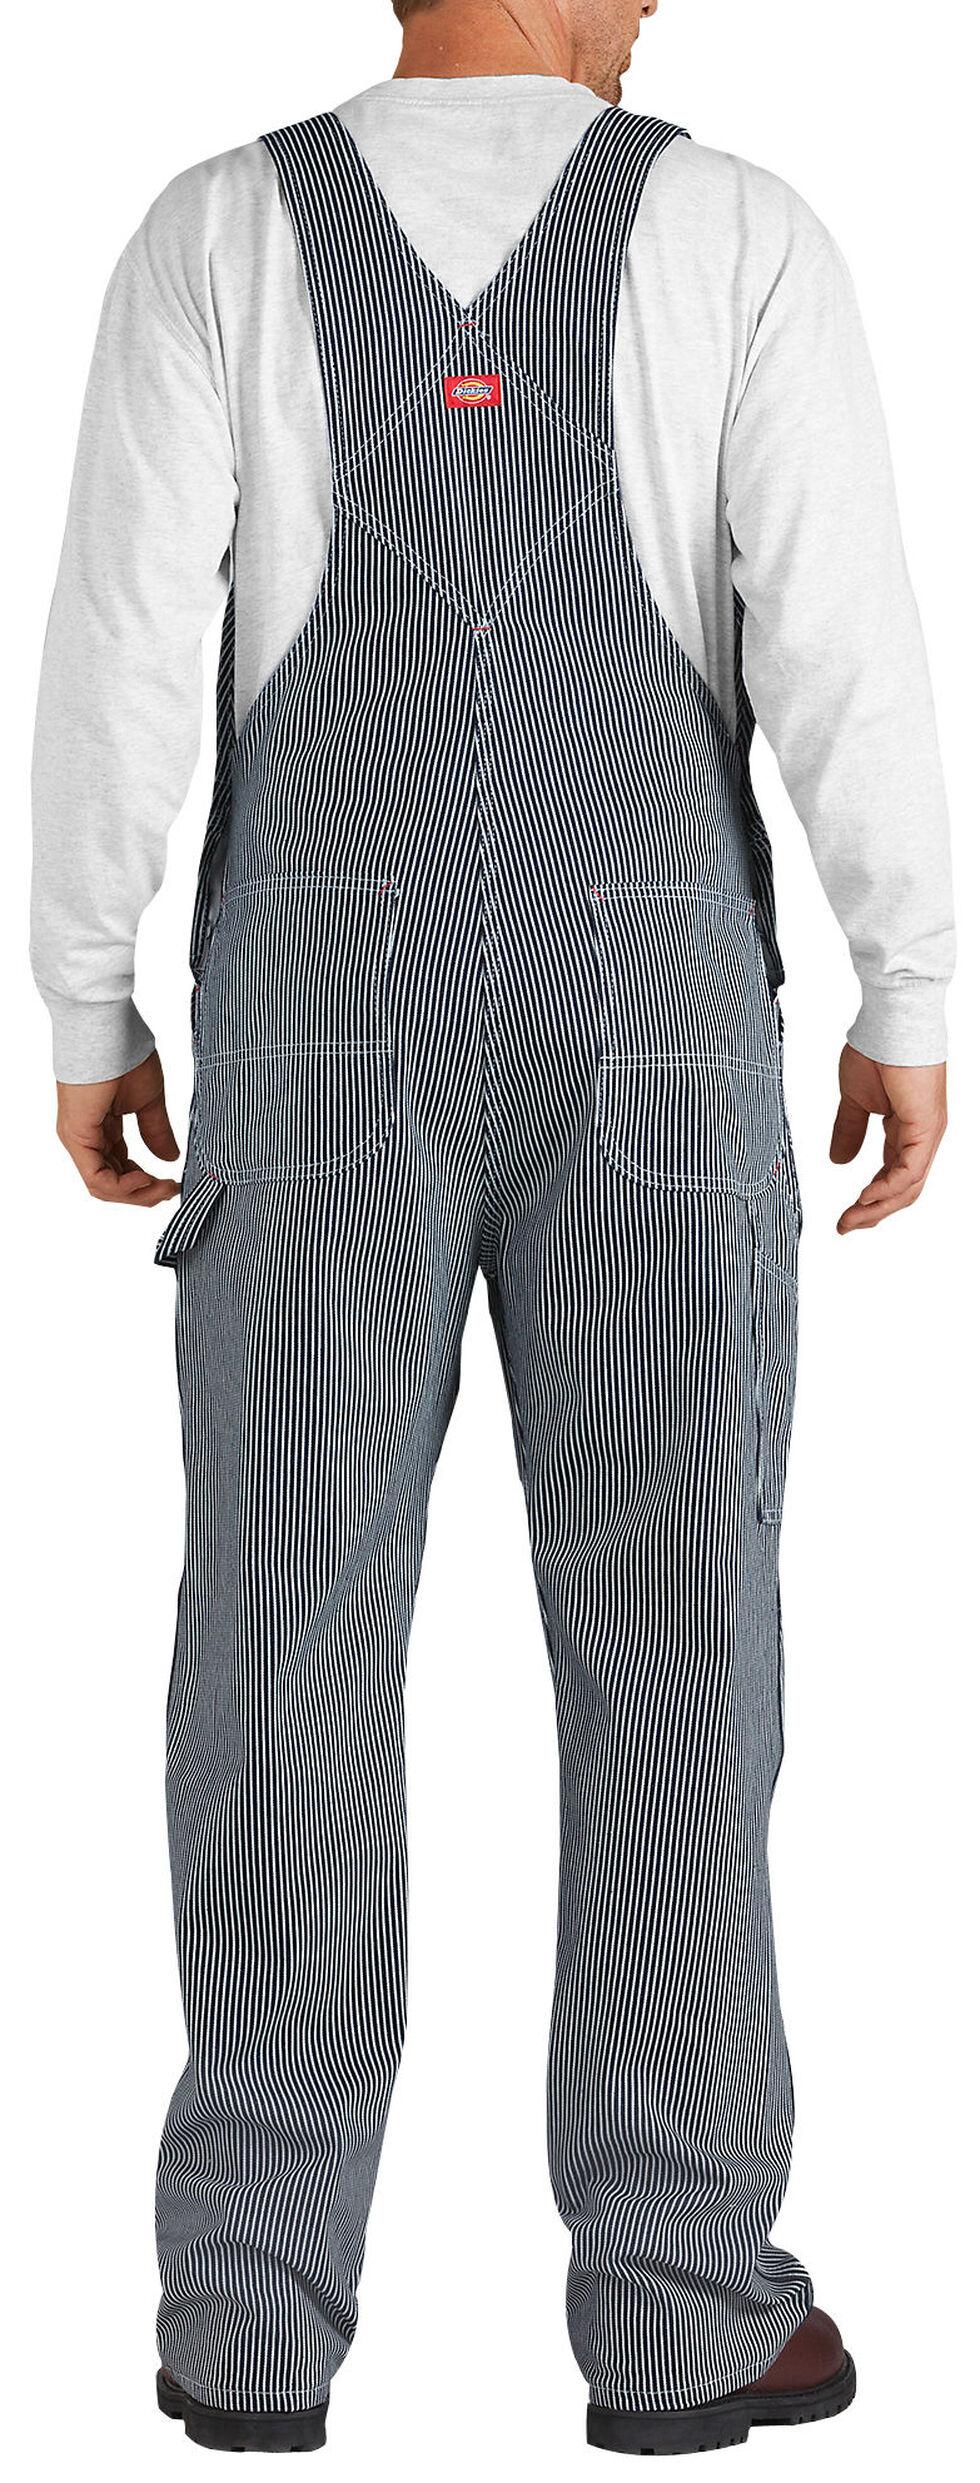 Dickies ® Hickory Stripe Overalls, Denim, hi-res